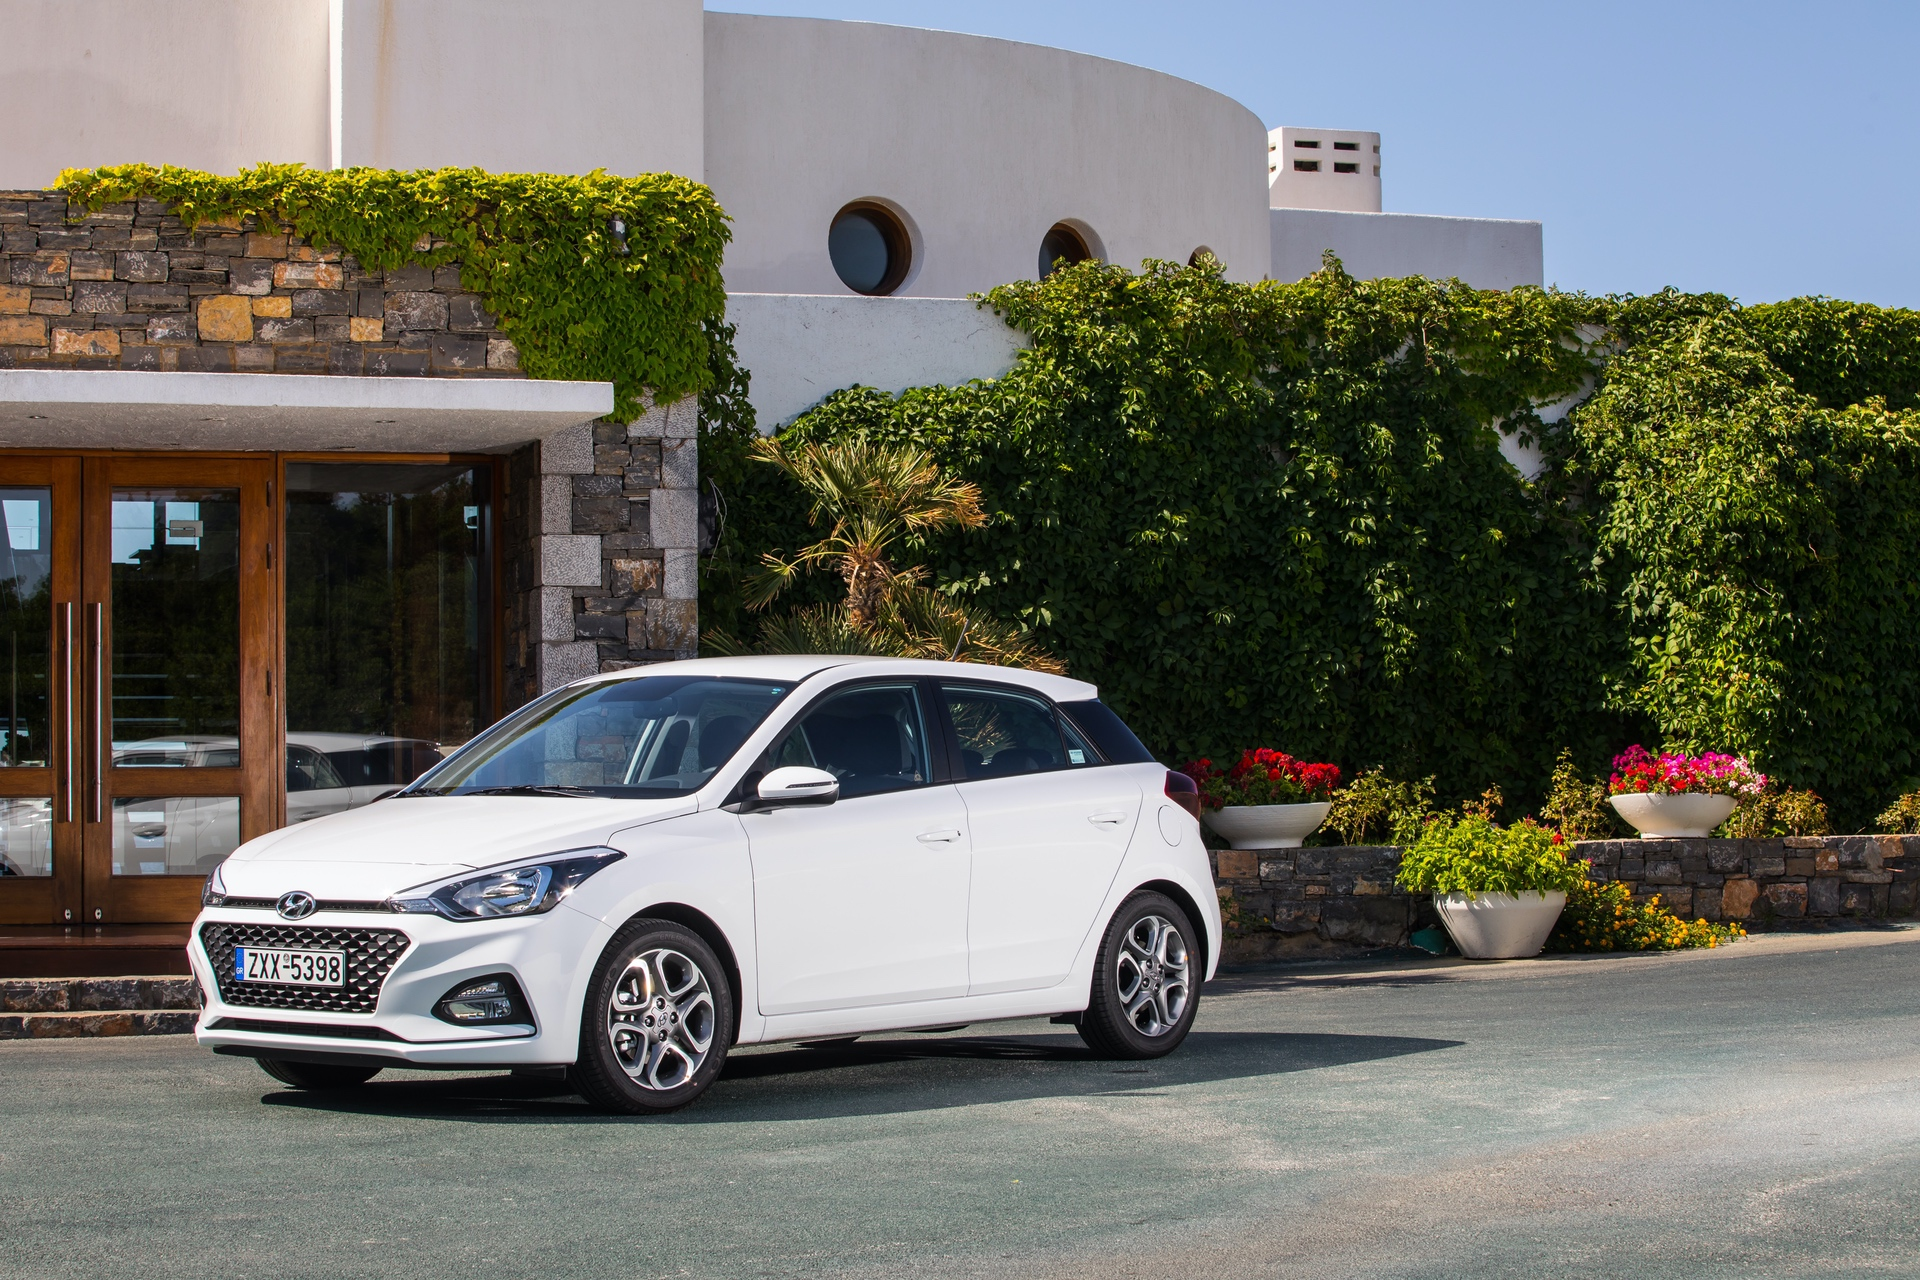 Hyundai_i20_facelift_greek_presskit_0002